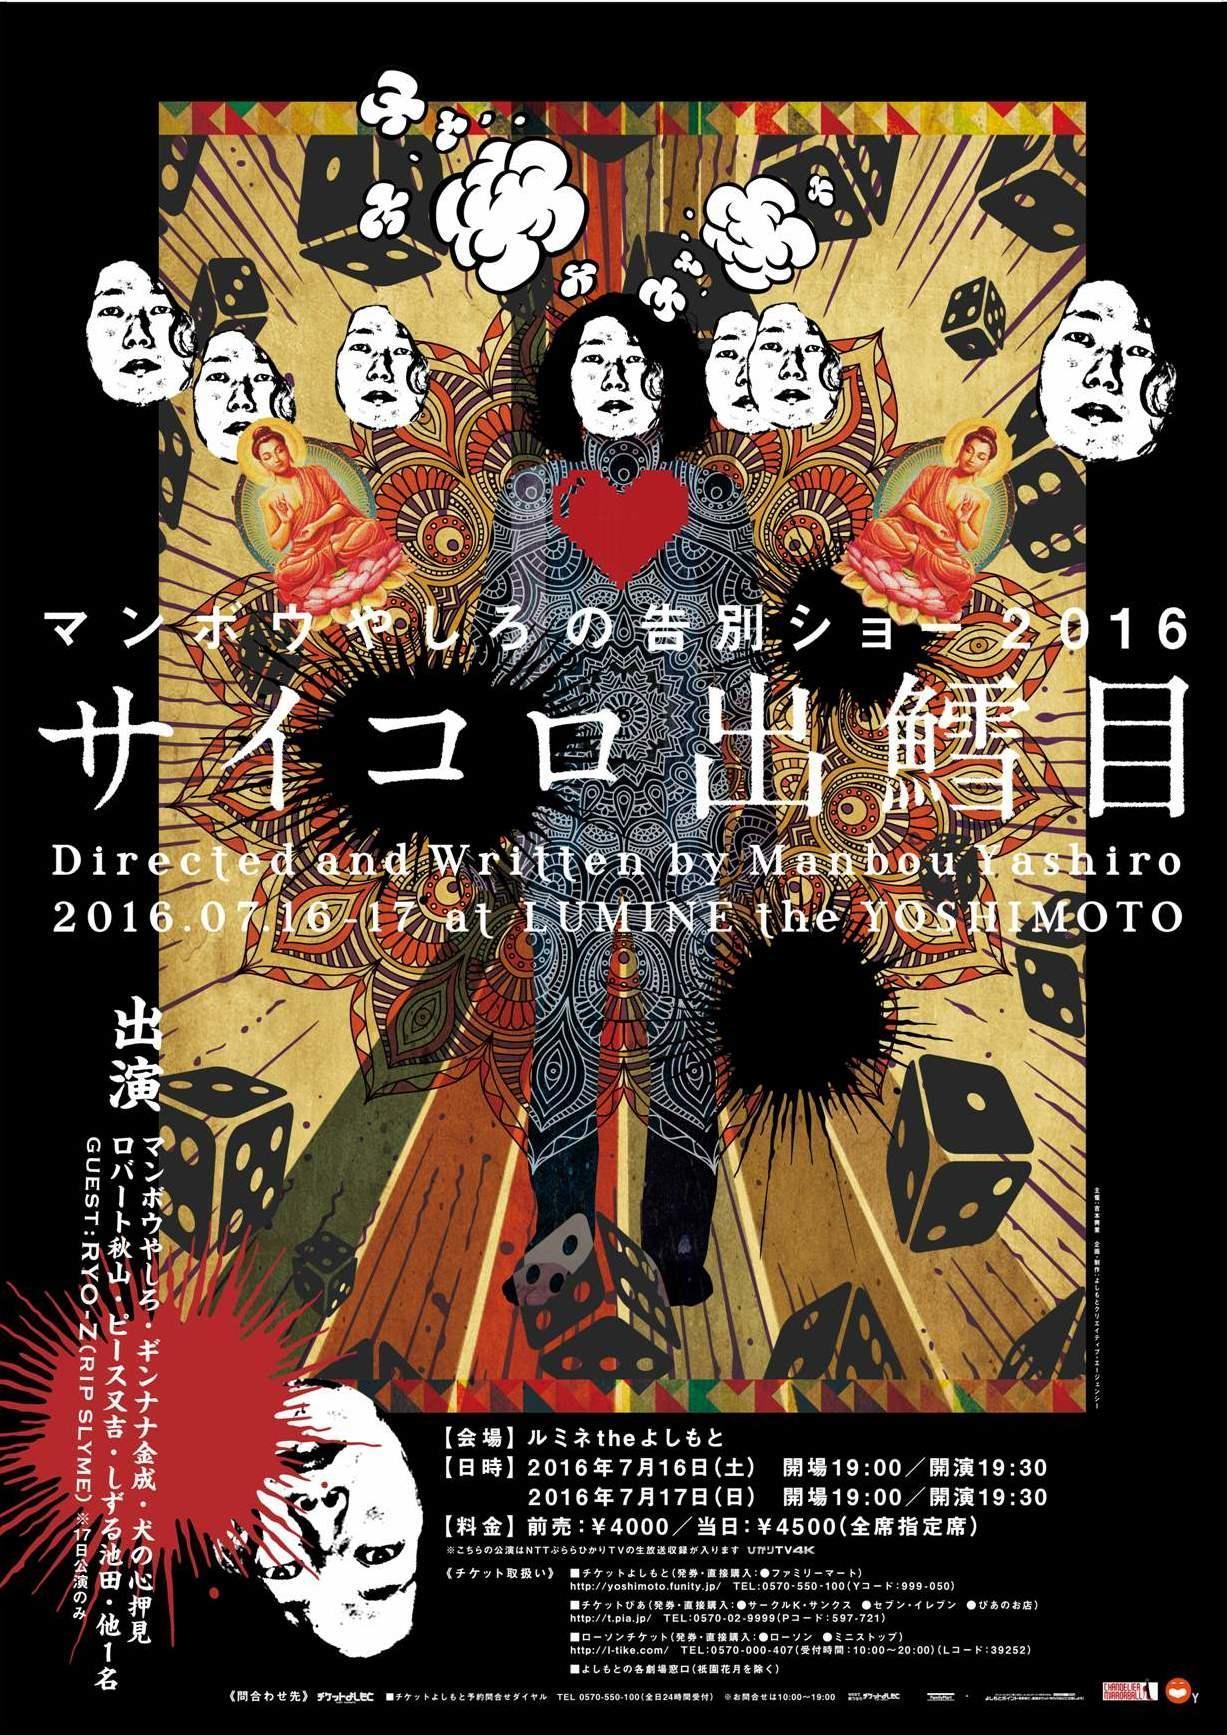 http://news.yoshimoto.co.jp/20160630163512-13bec9df21843e24f42eb3ee4c9458dab8c4904a.jpg